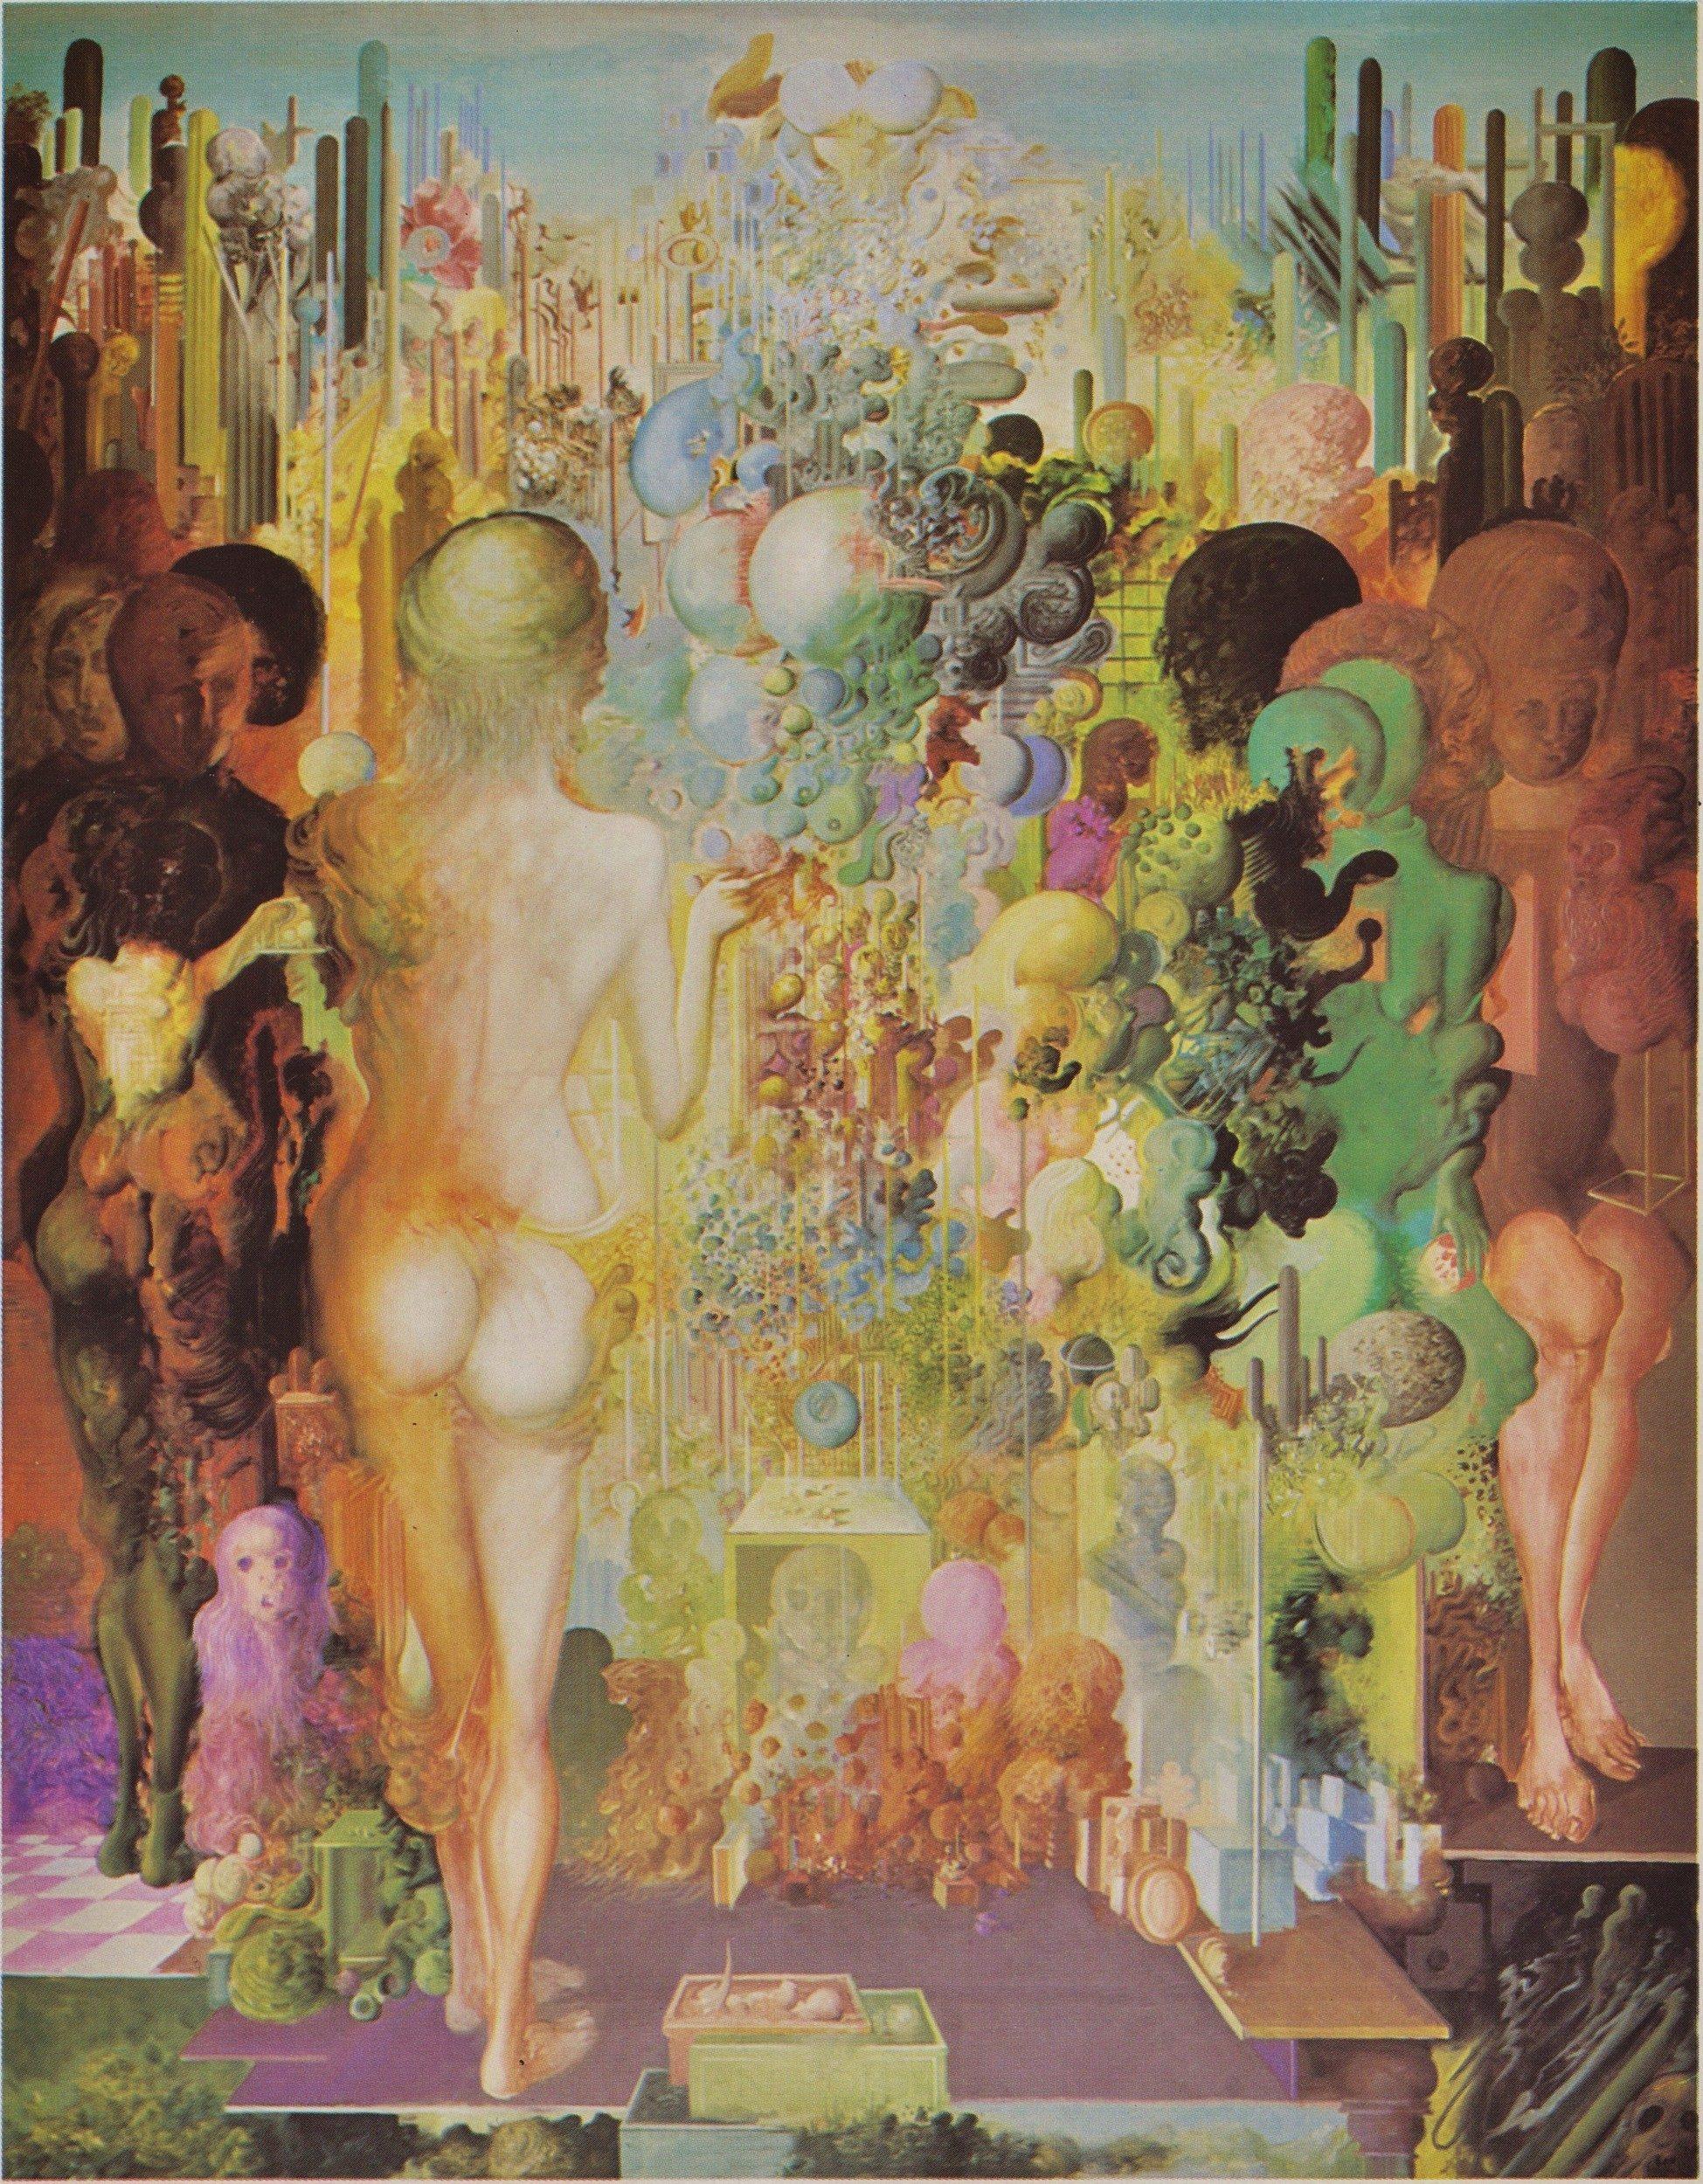 Ljuba Popovic - La création des androïdes, 1970